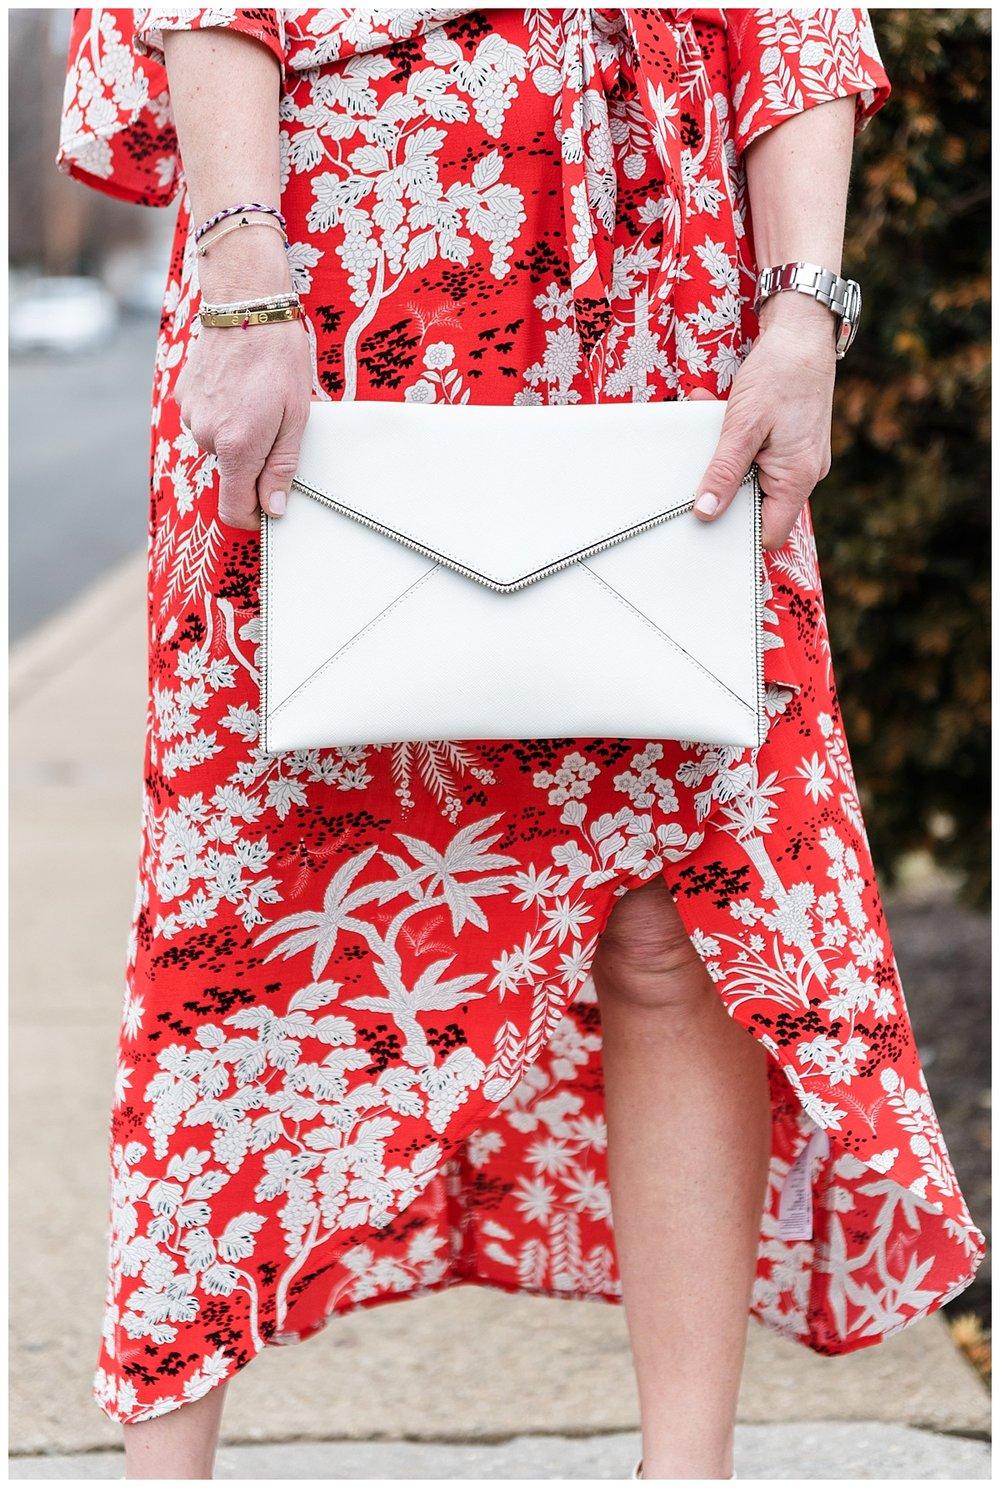 Red floral dress_1106.jpg